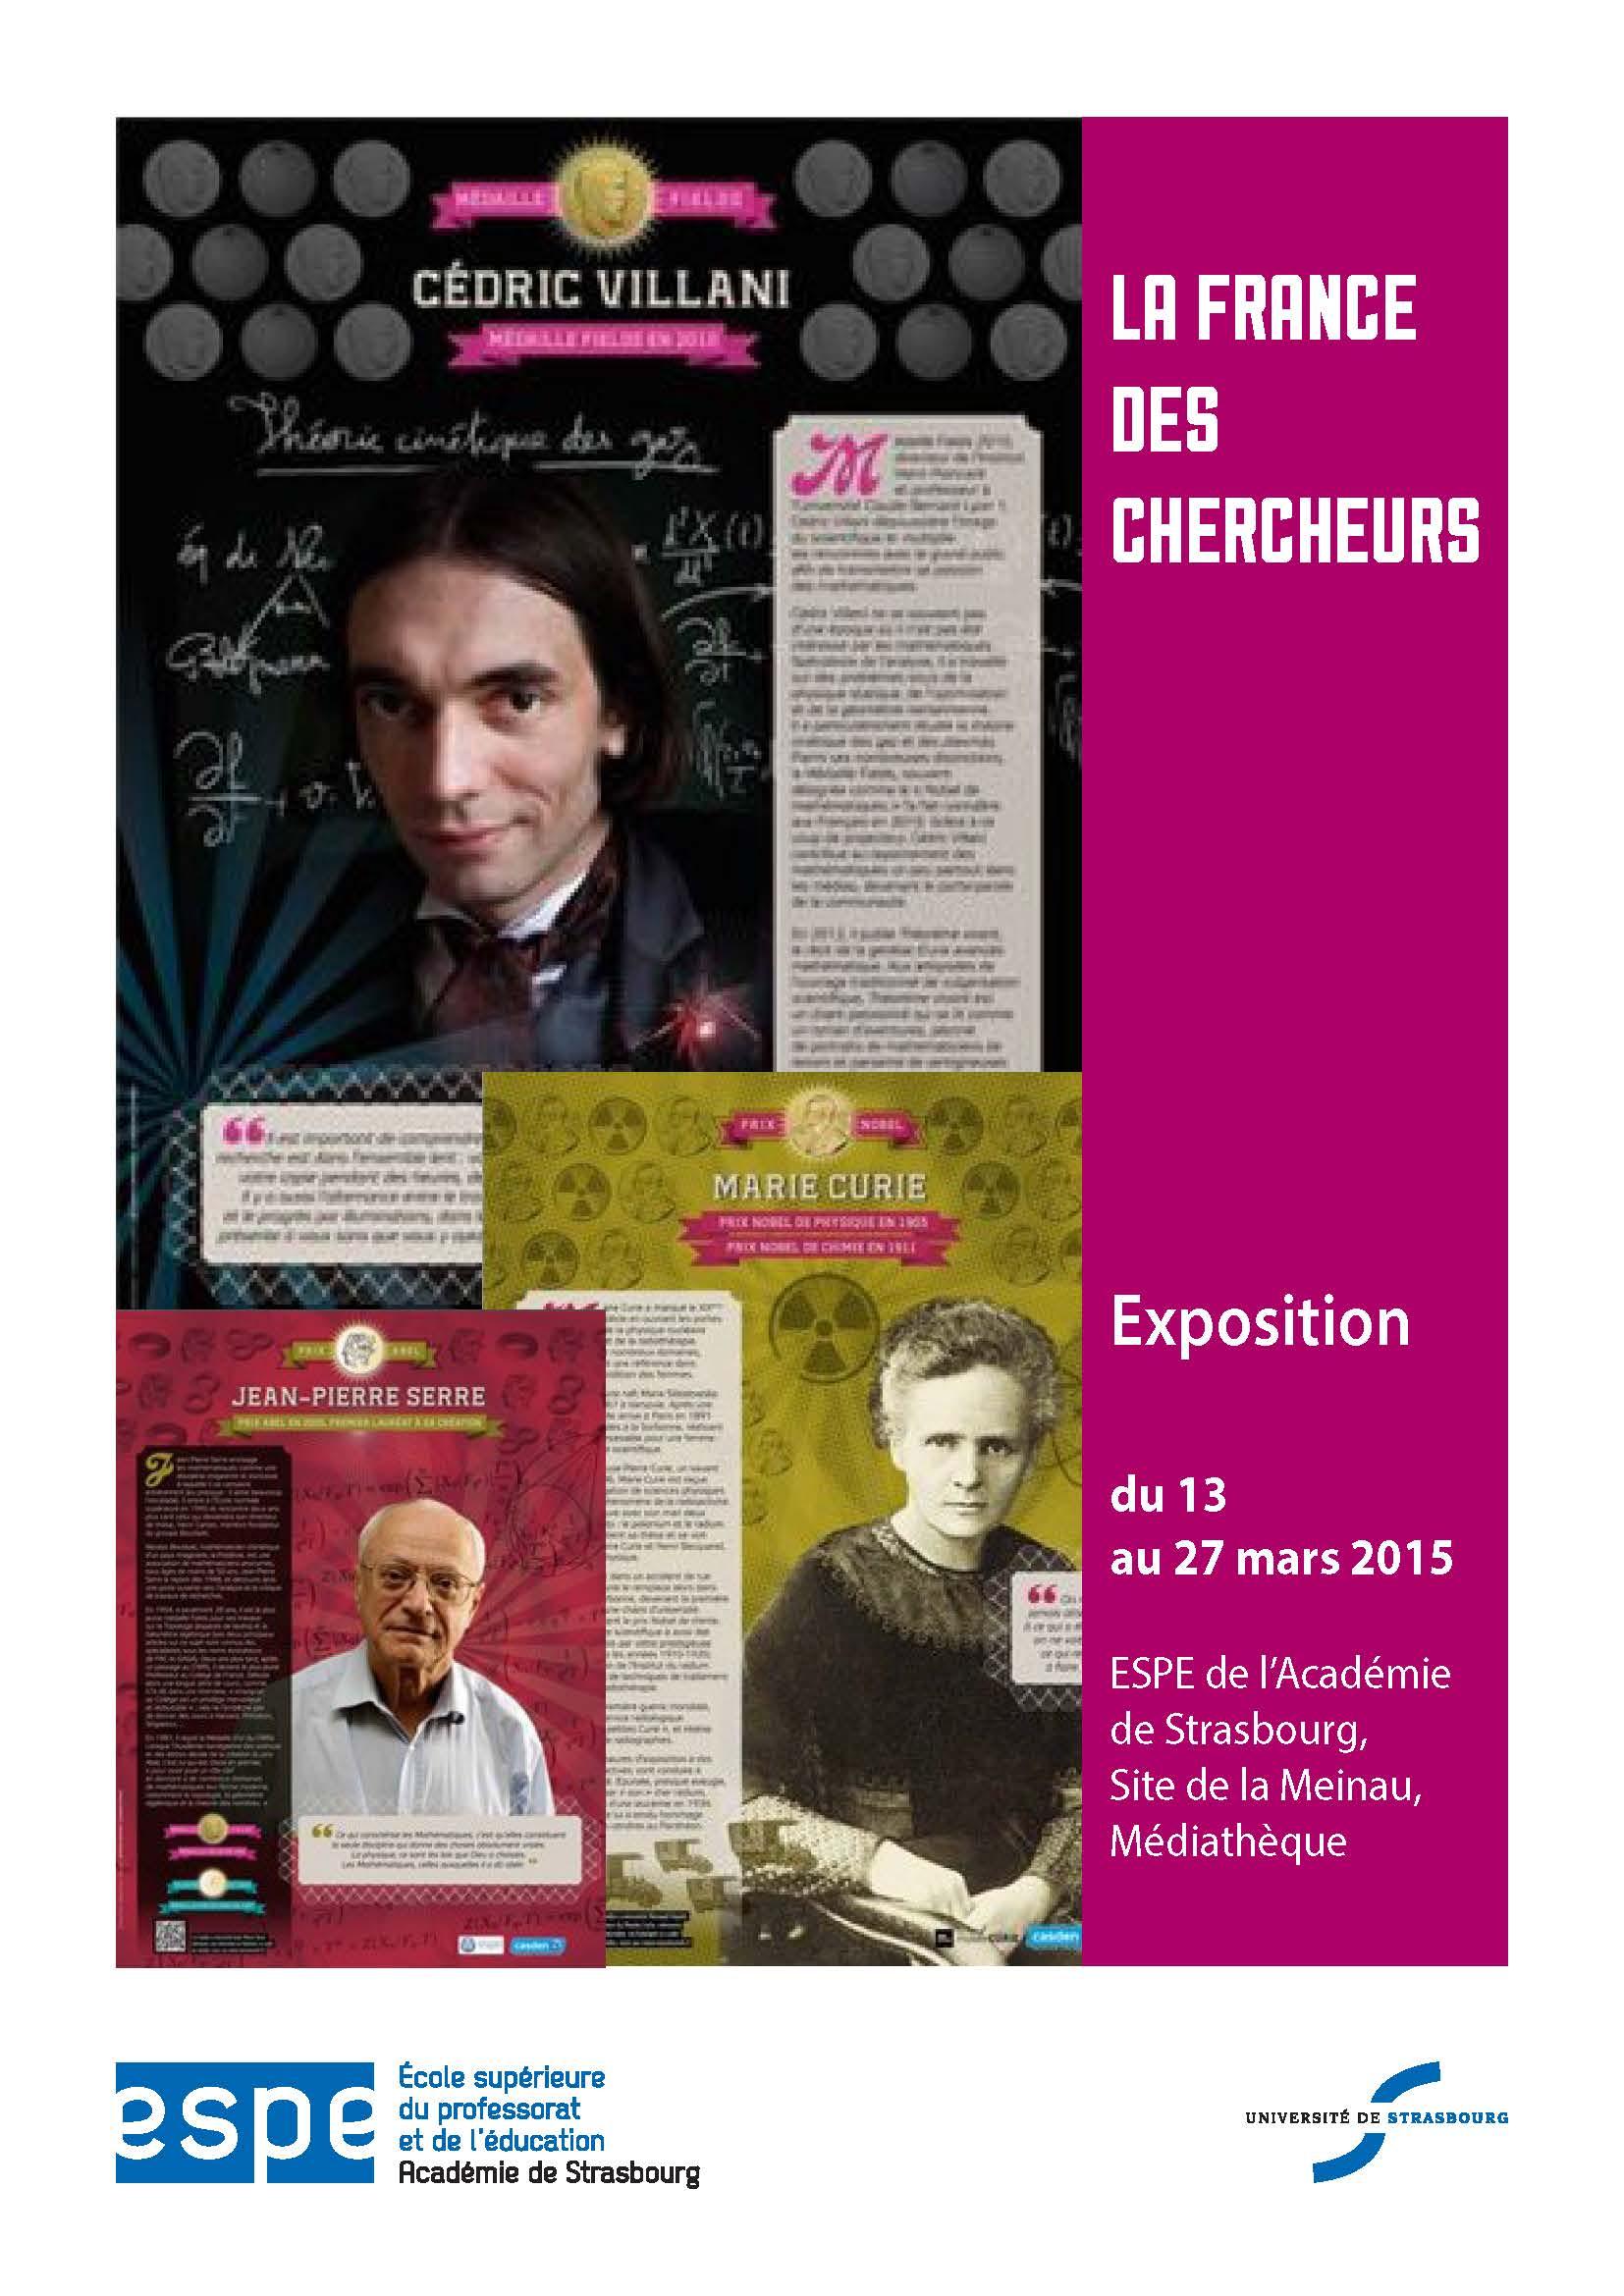 La France des chercheurs : portraits de Prix Nobel